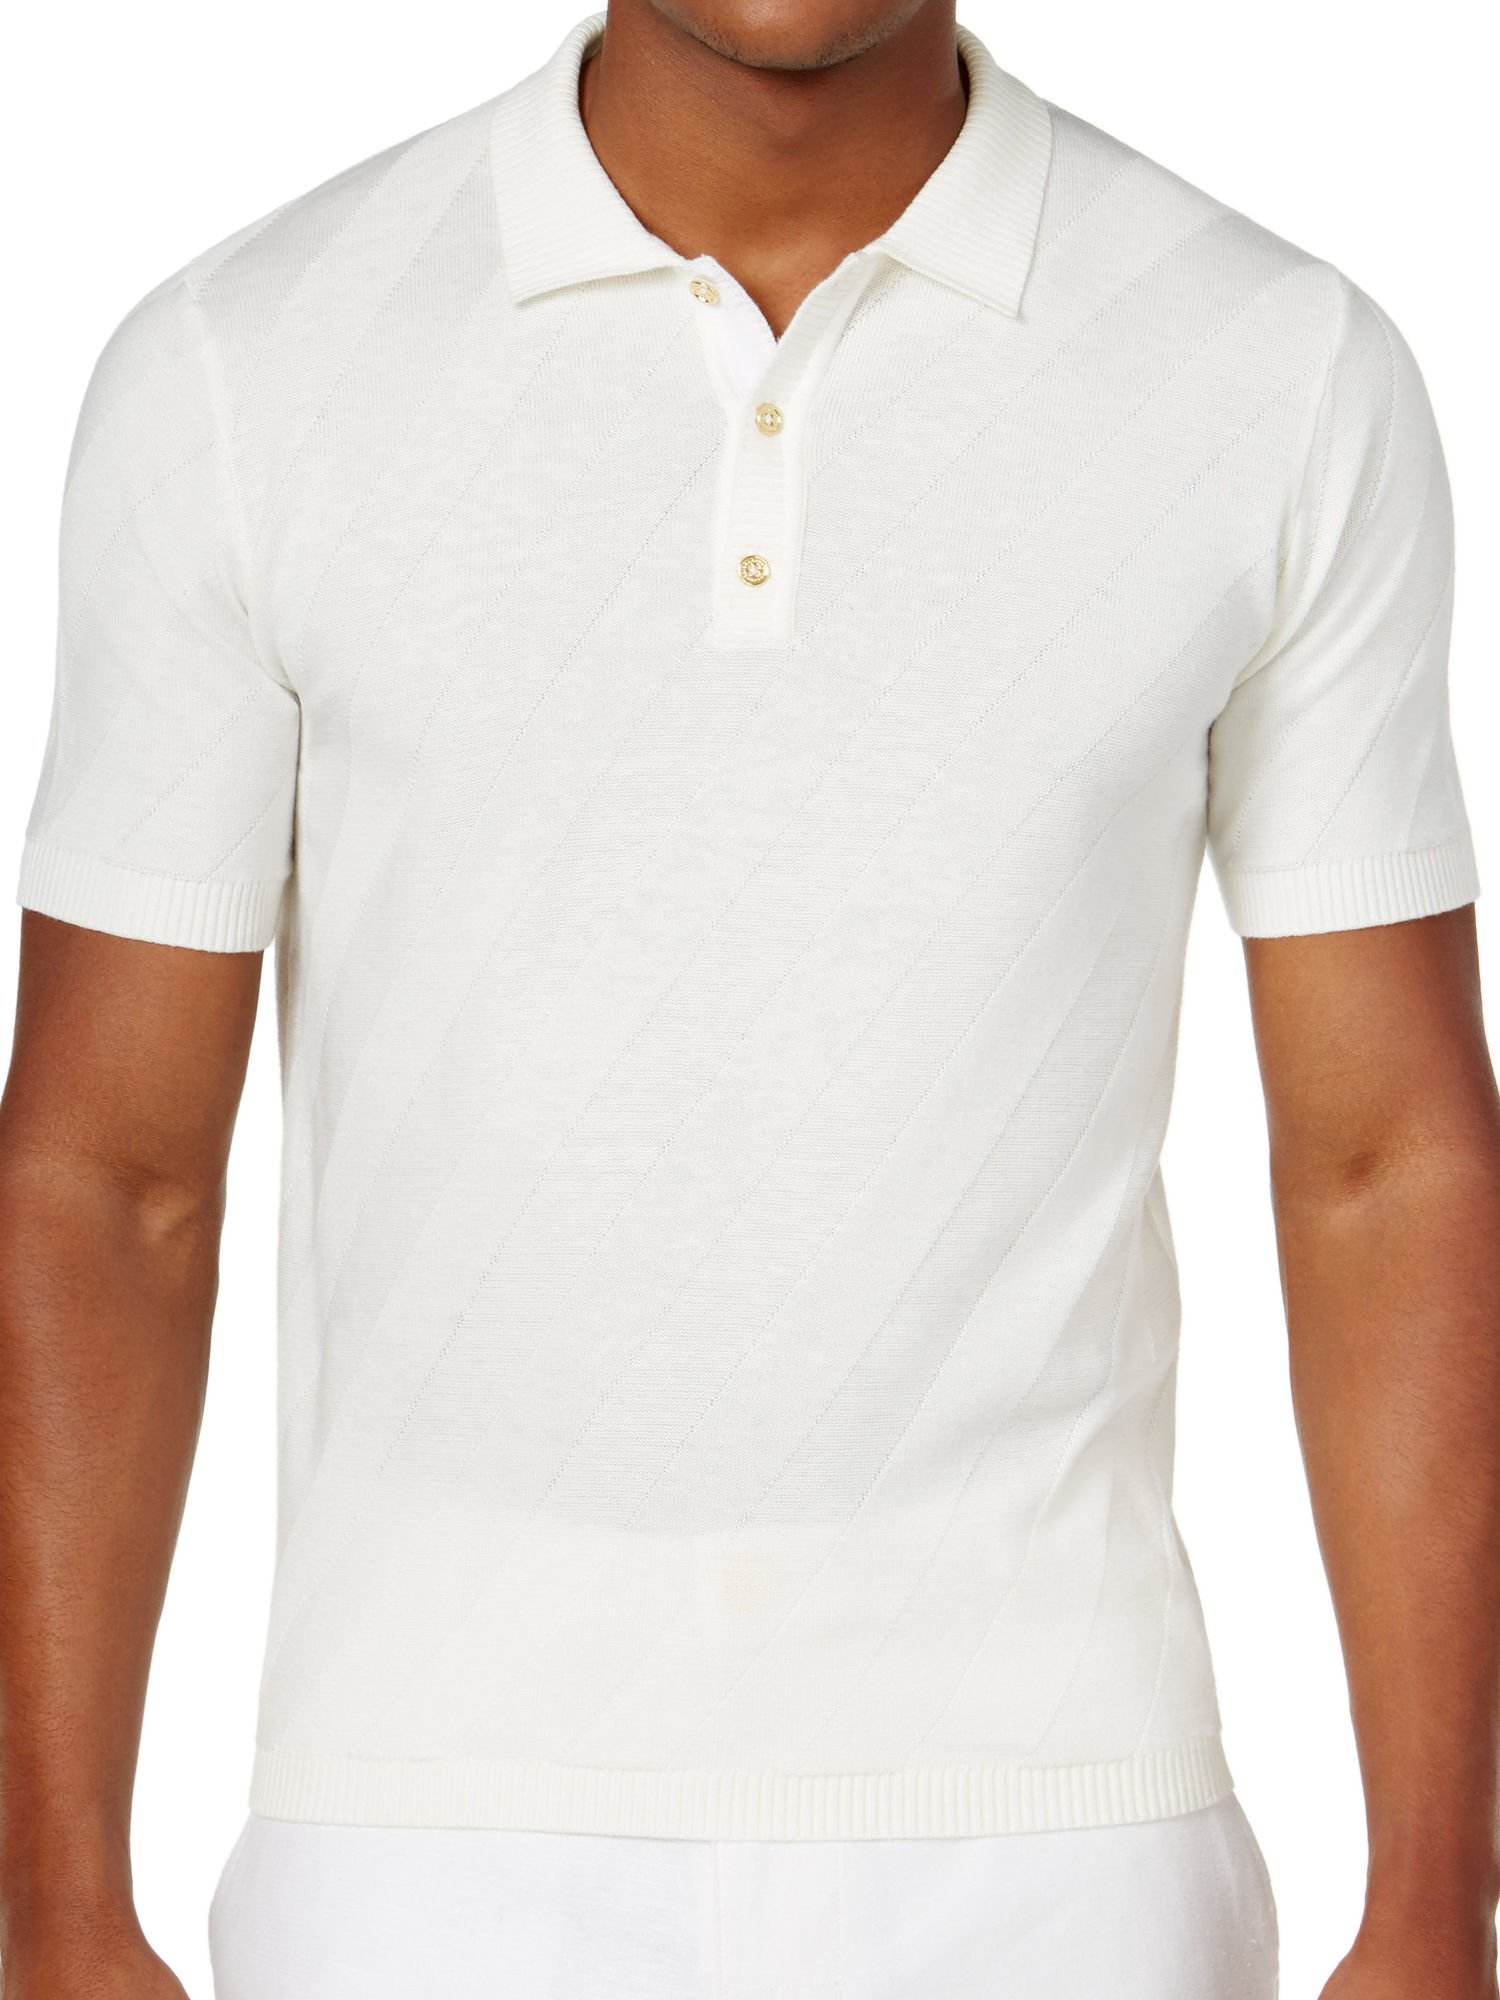 Sean John Men's Jacquard Stripe Sweater Polo (4XL, Cream)